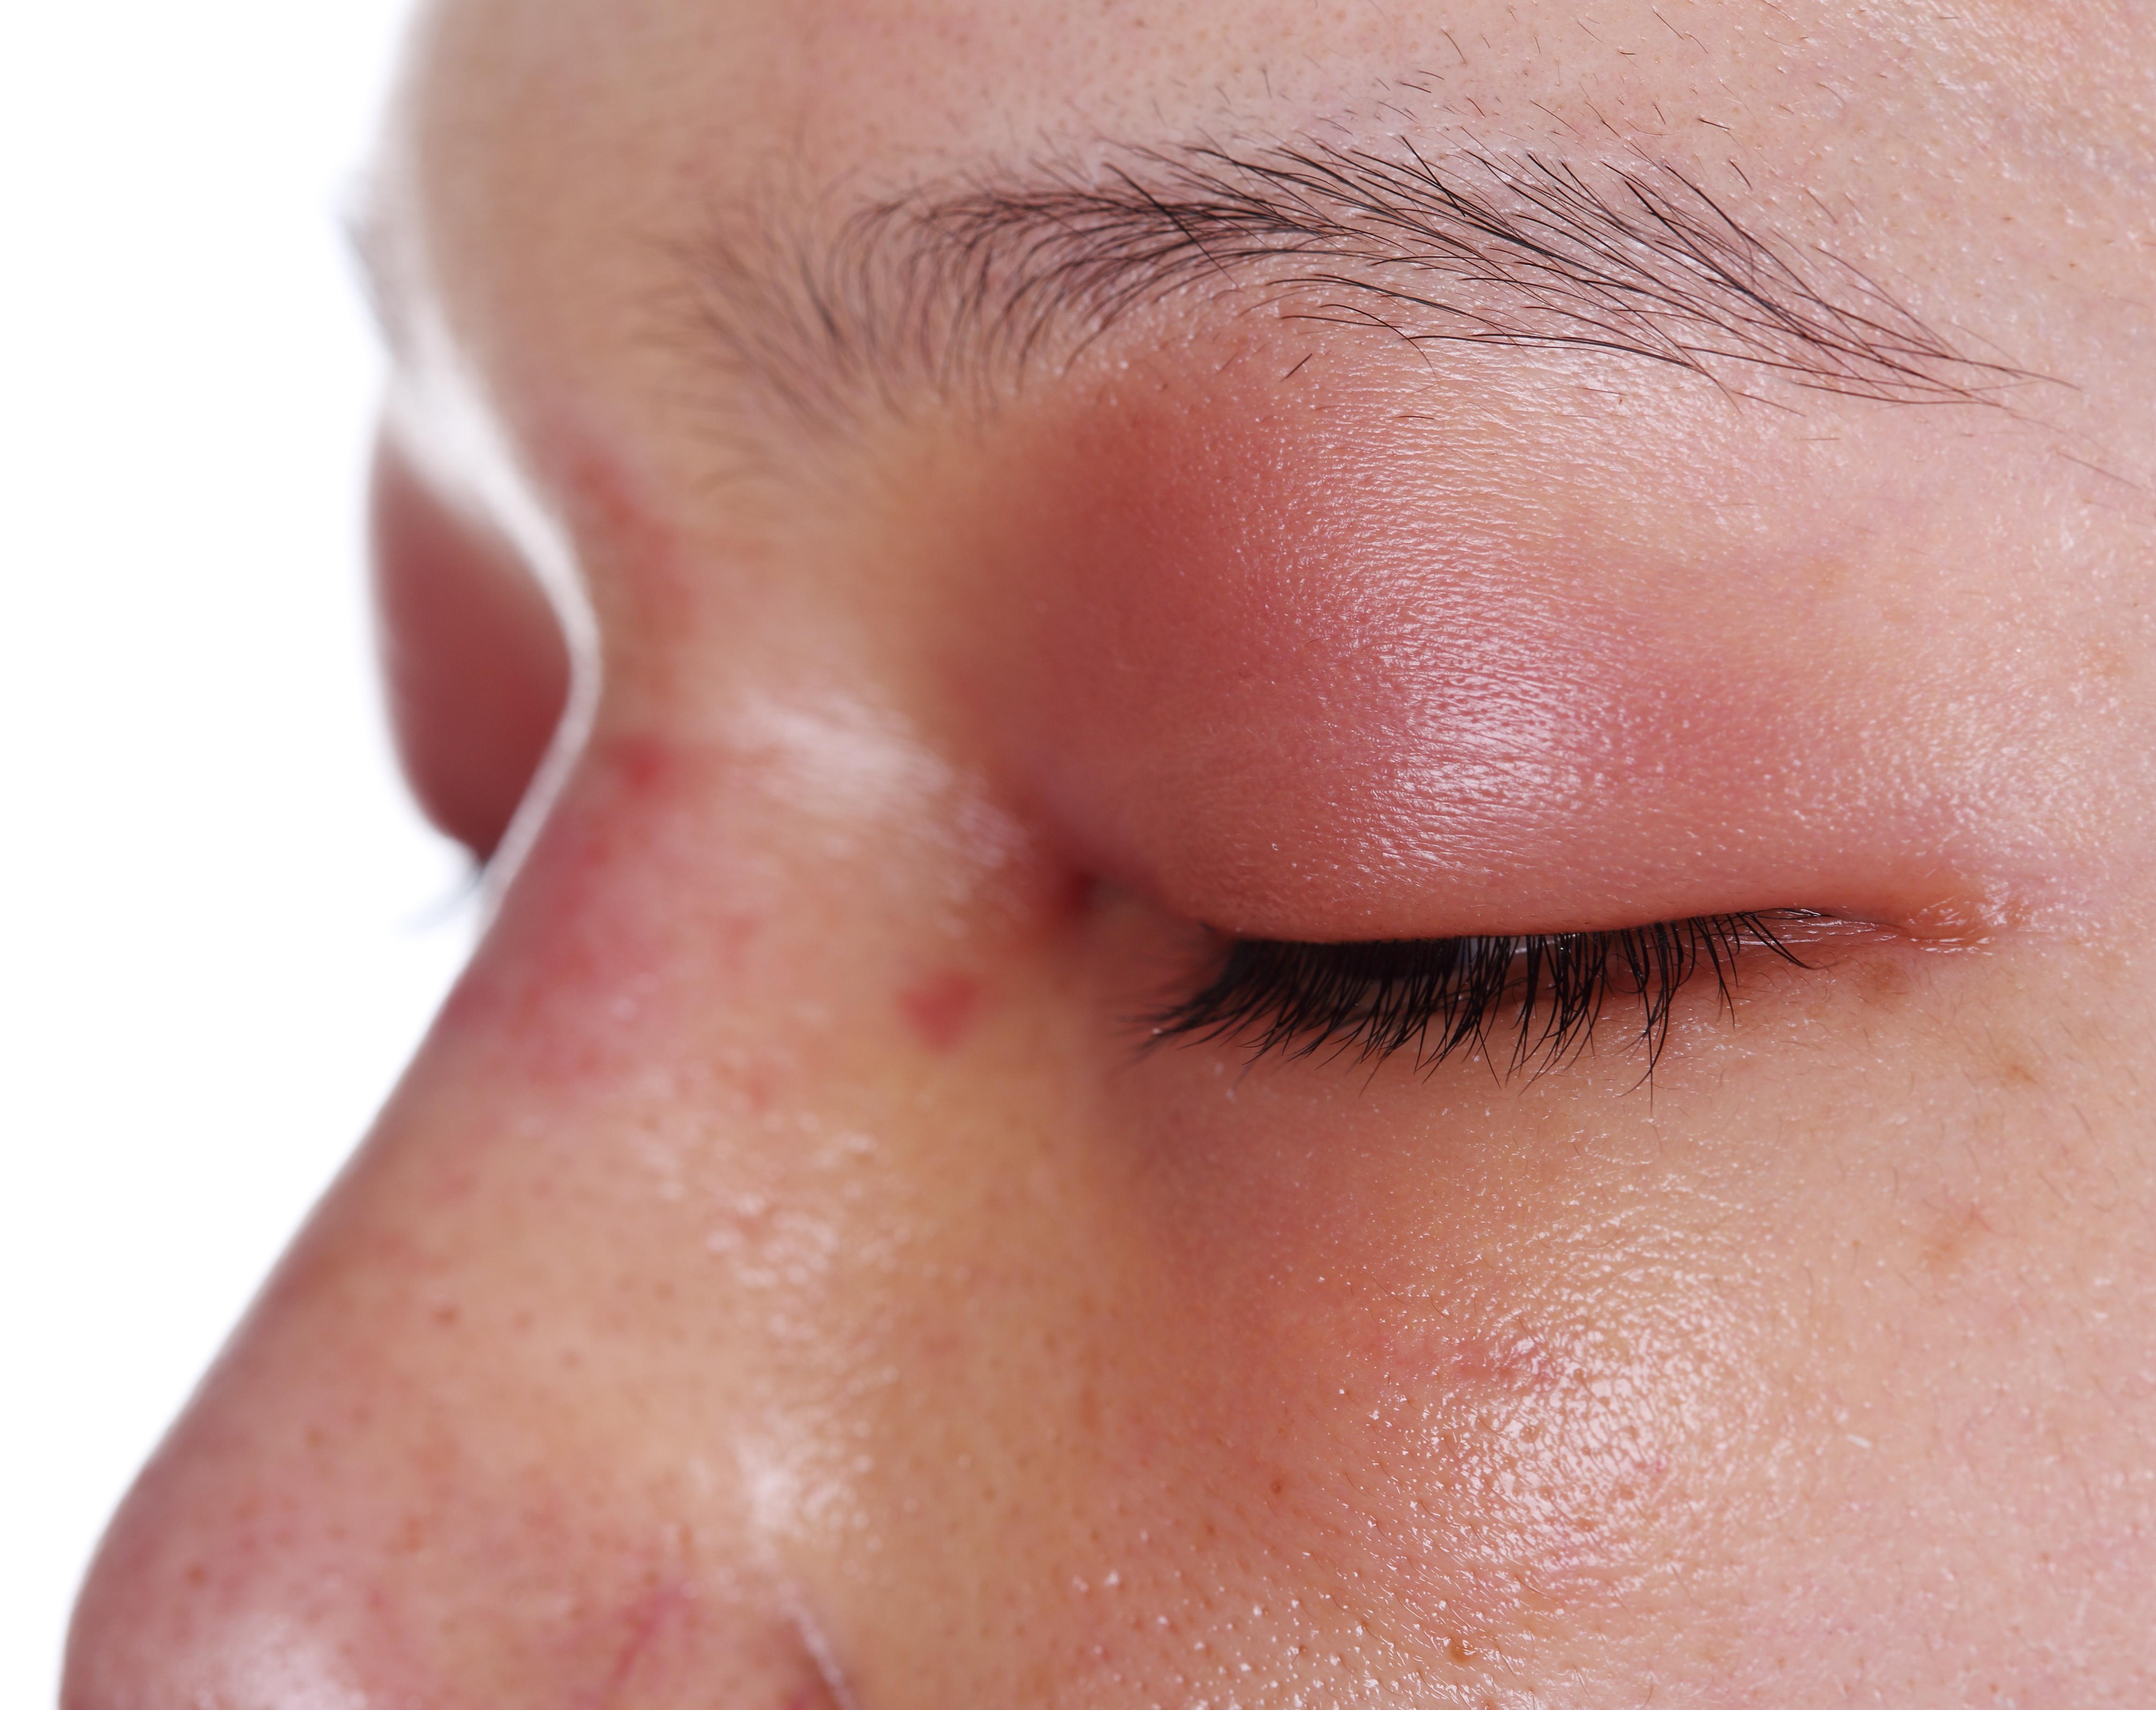 Lidrandentzündung (Blepharitis): Ursachen, Symptome und Behandlung